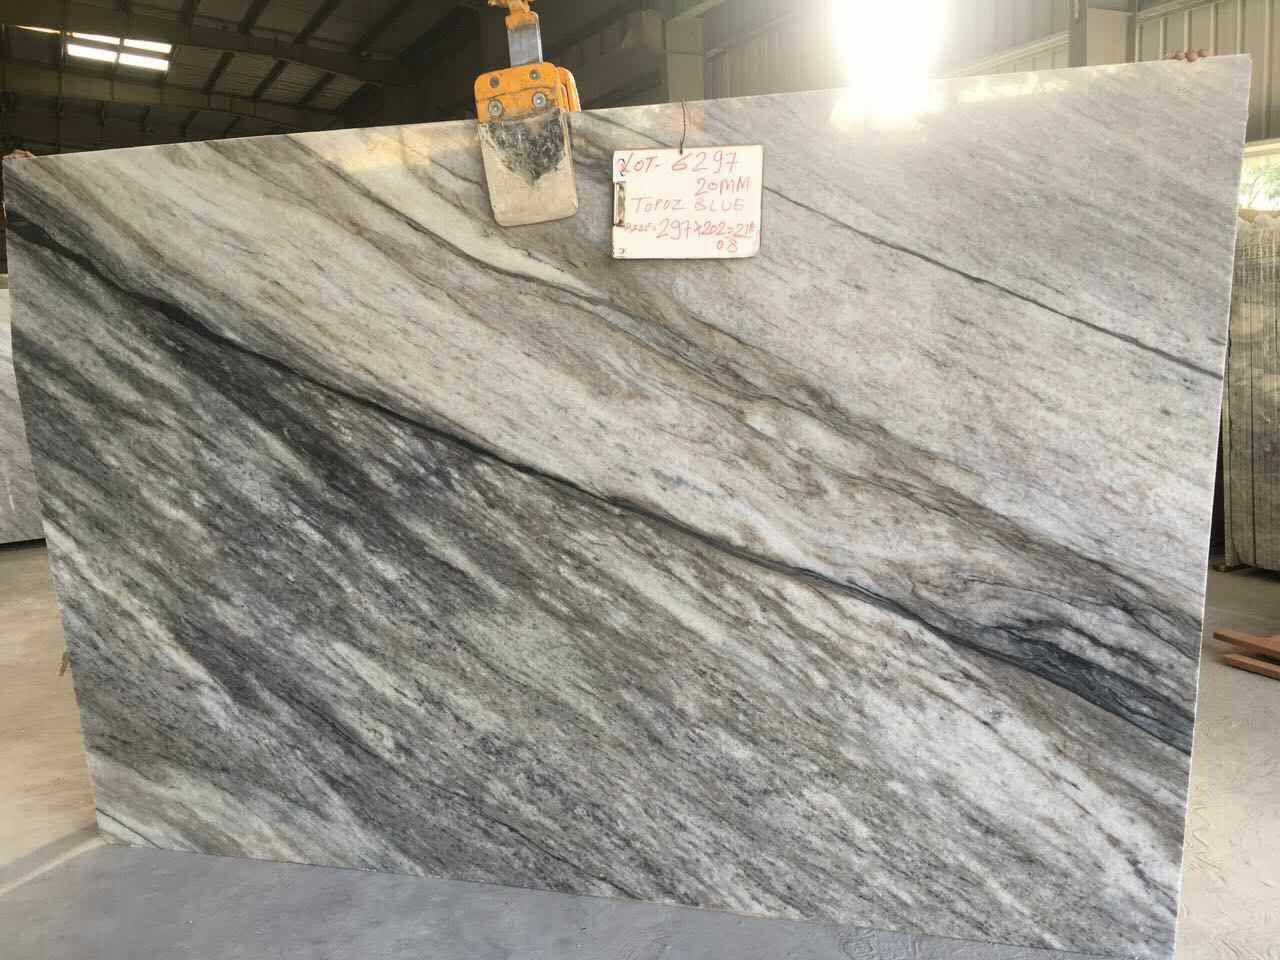 Topoz blue marble